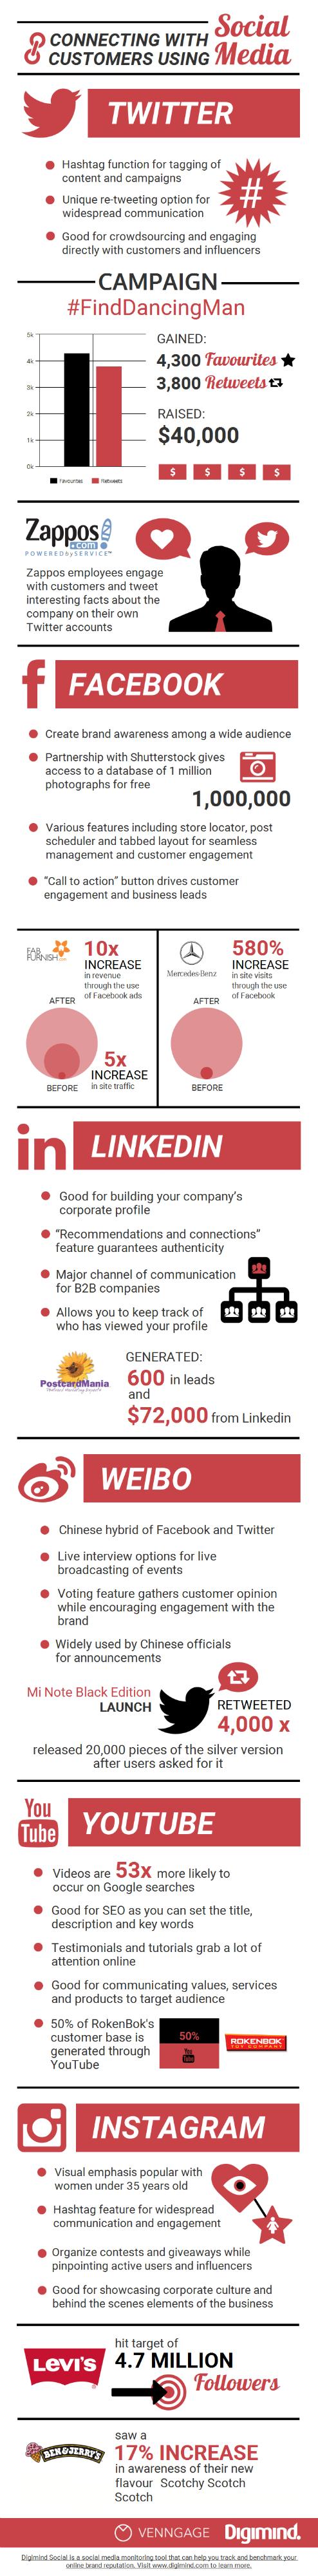 digimind-socialmedia-platforms-infographic